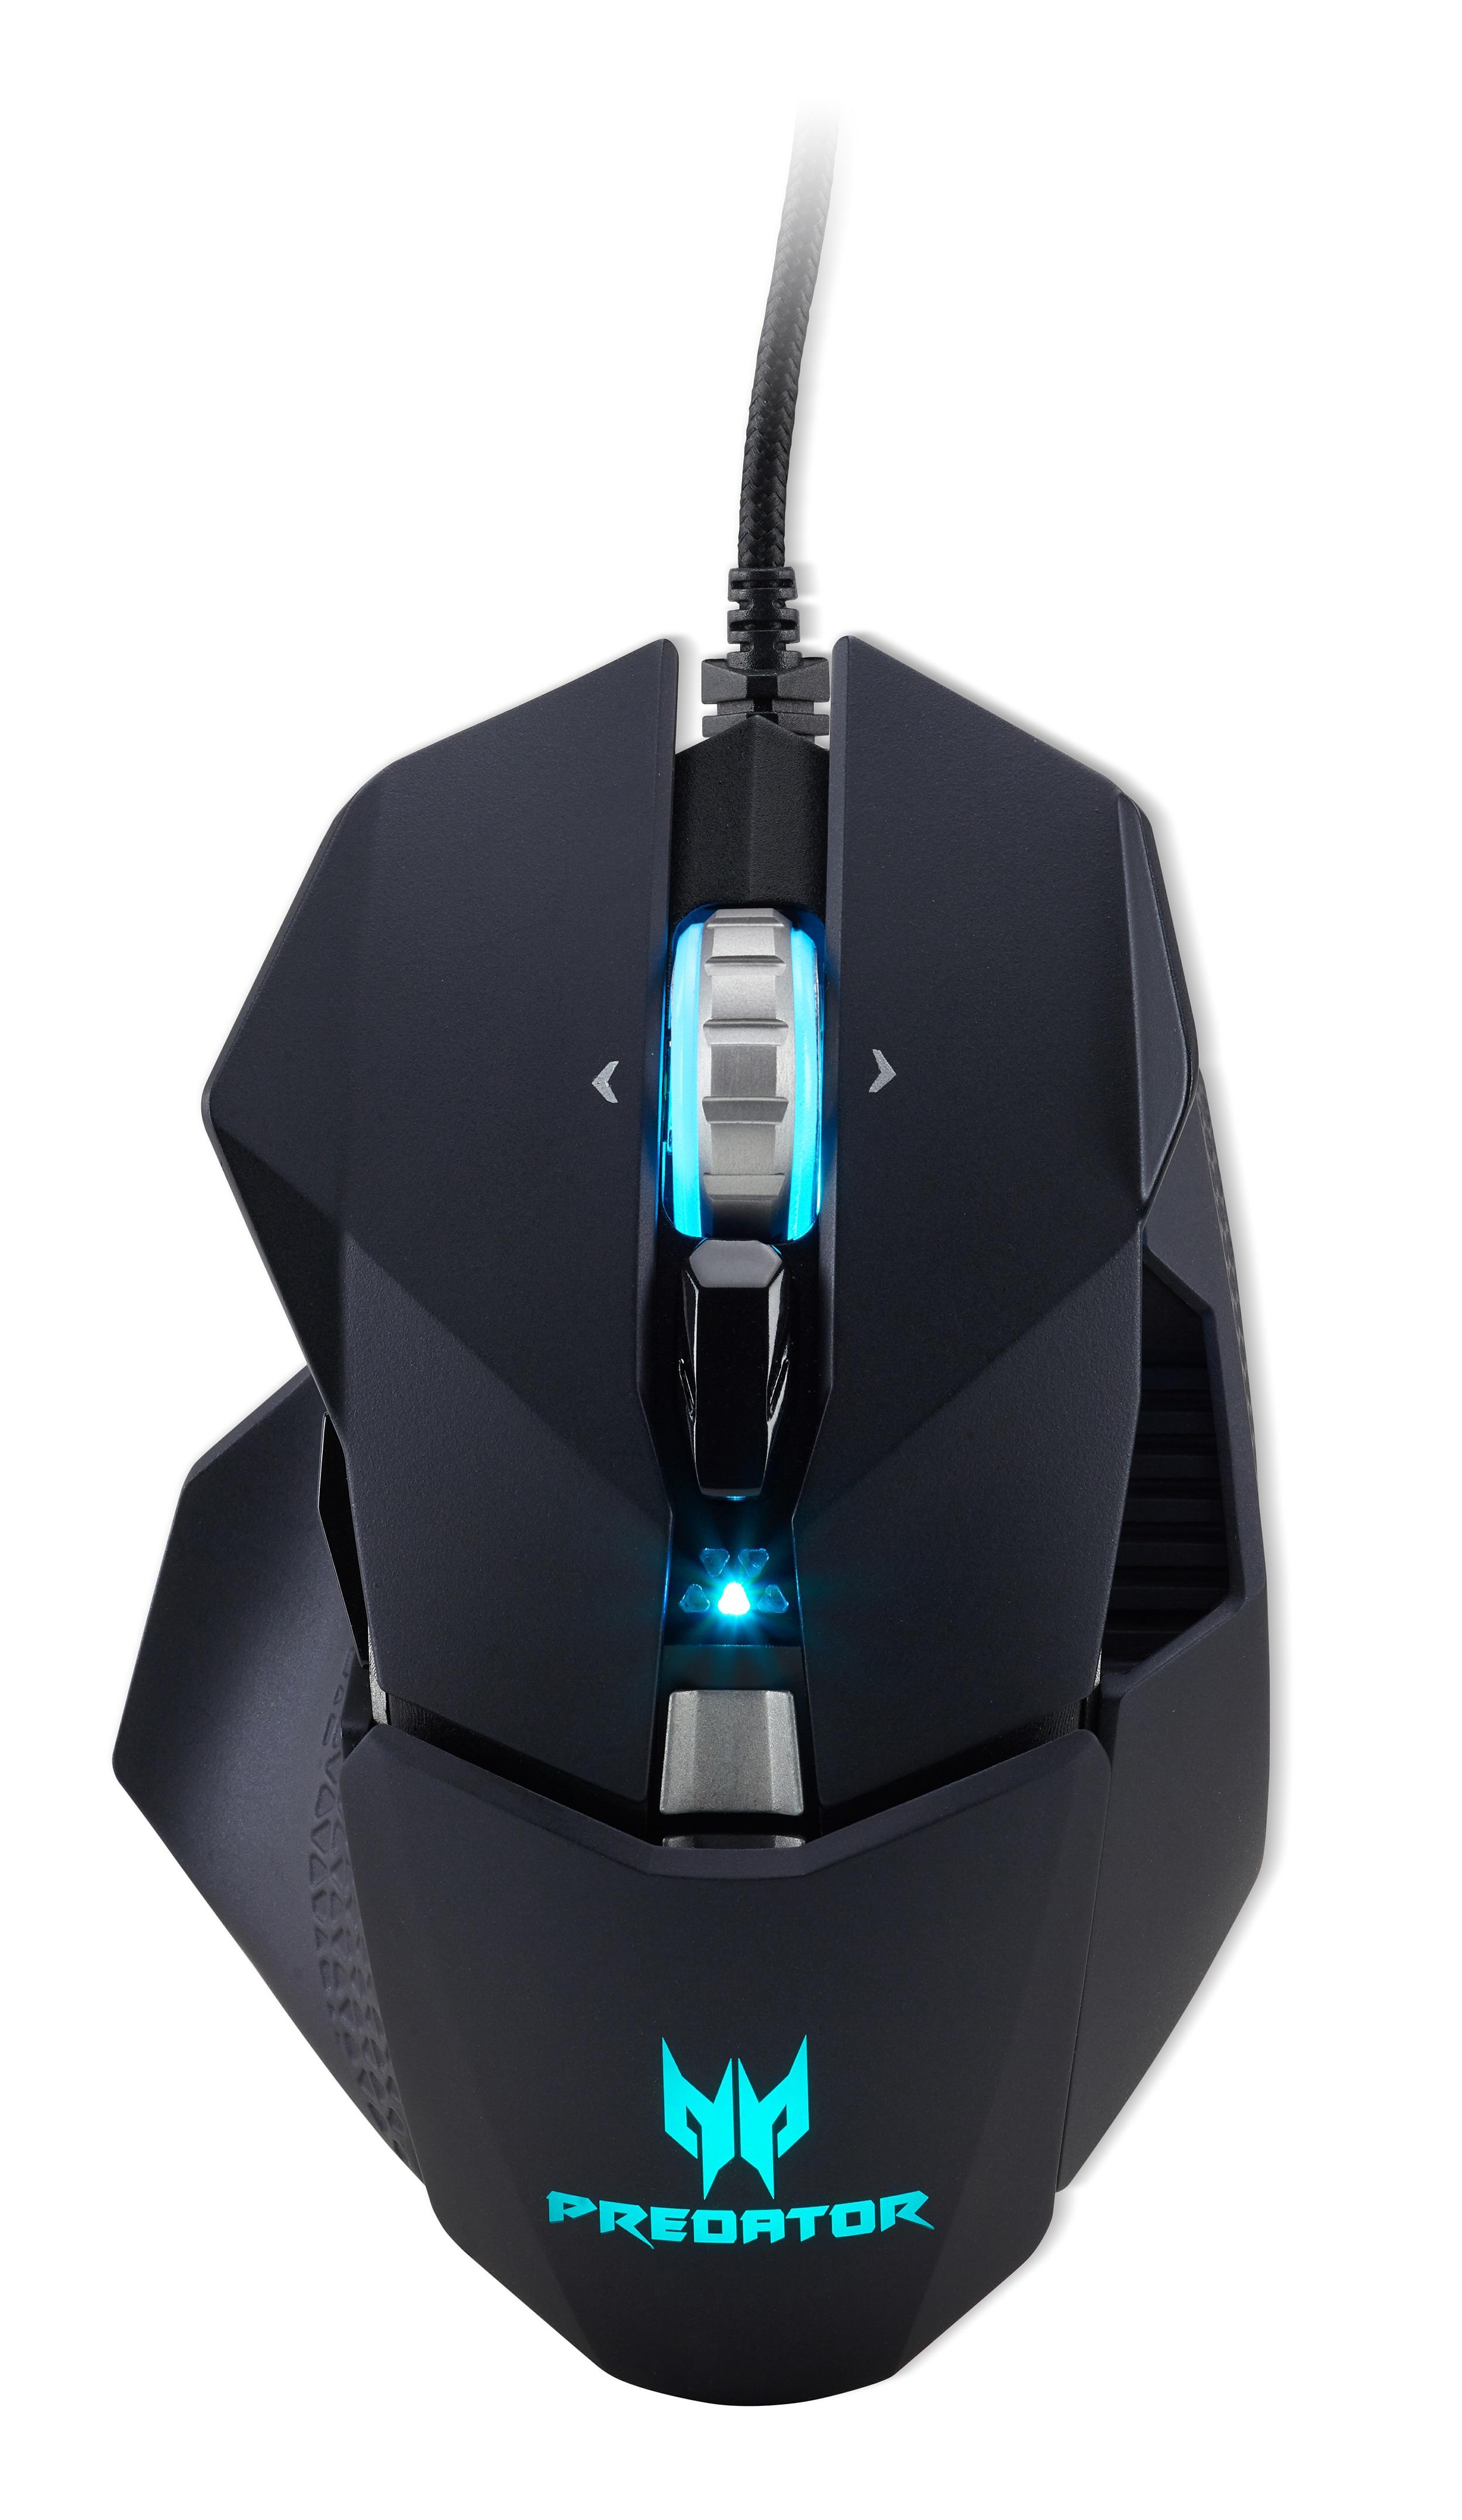 Predator_Cestus_510_Mouse_black_01